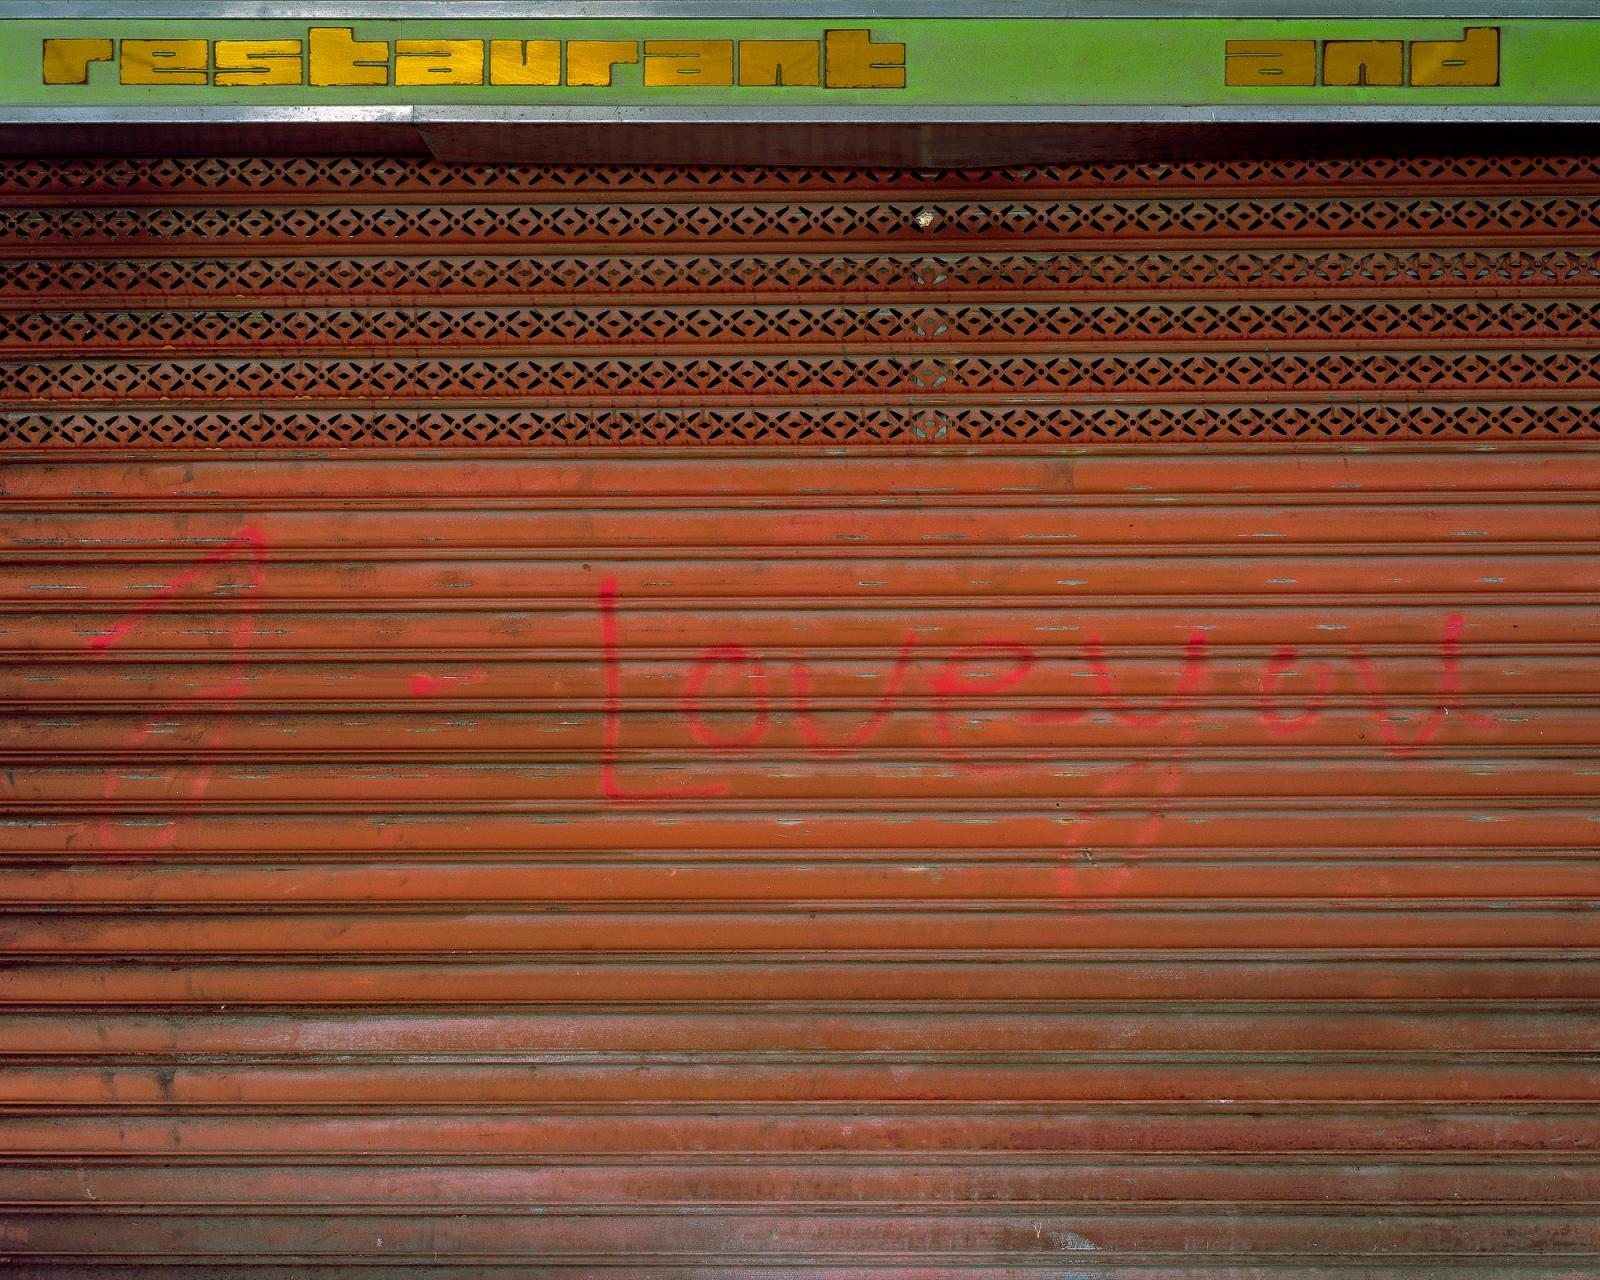 "Cheung Shan Estate, 10/2012 Archival Pigment Inkjet Print 28.8"" x 36"" / 40"" x 50"""